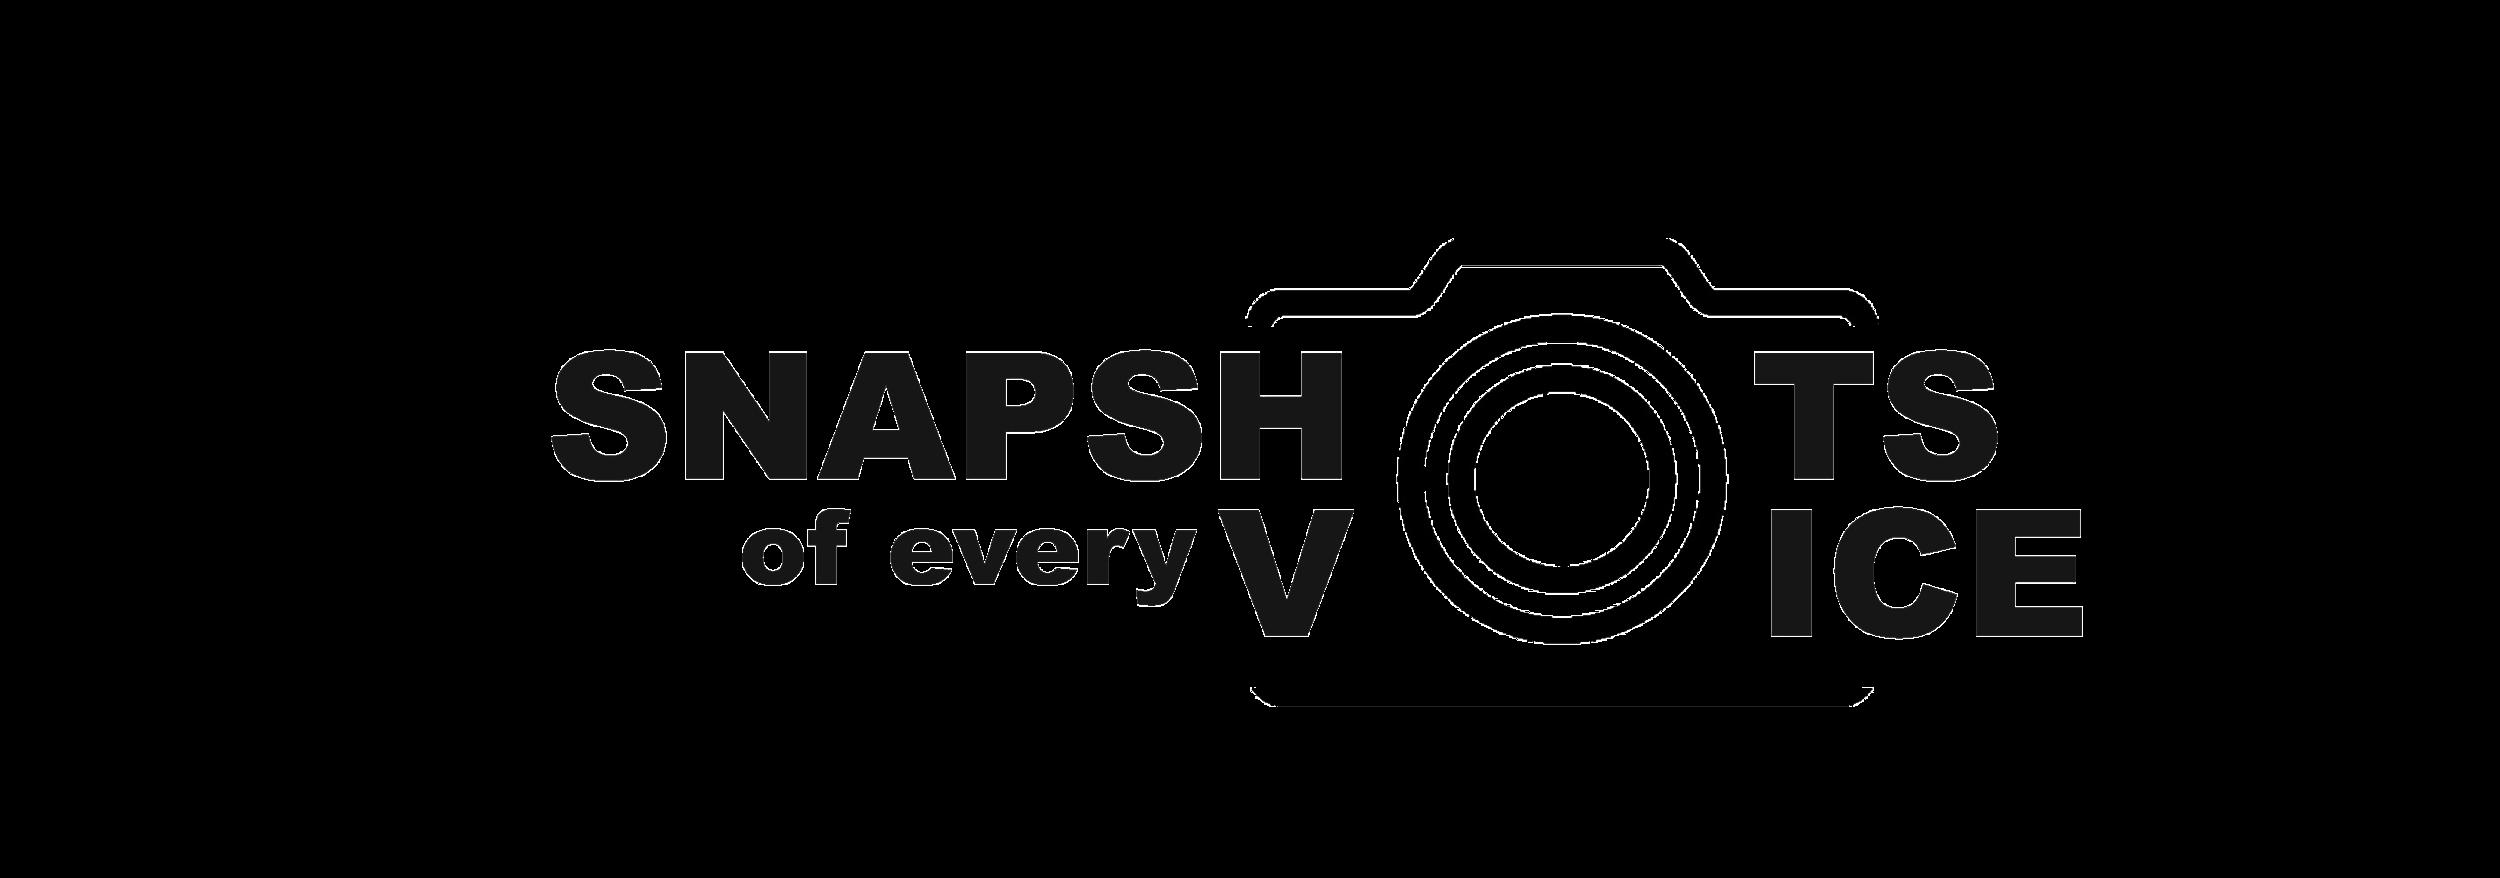 snapshots logo copy.png